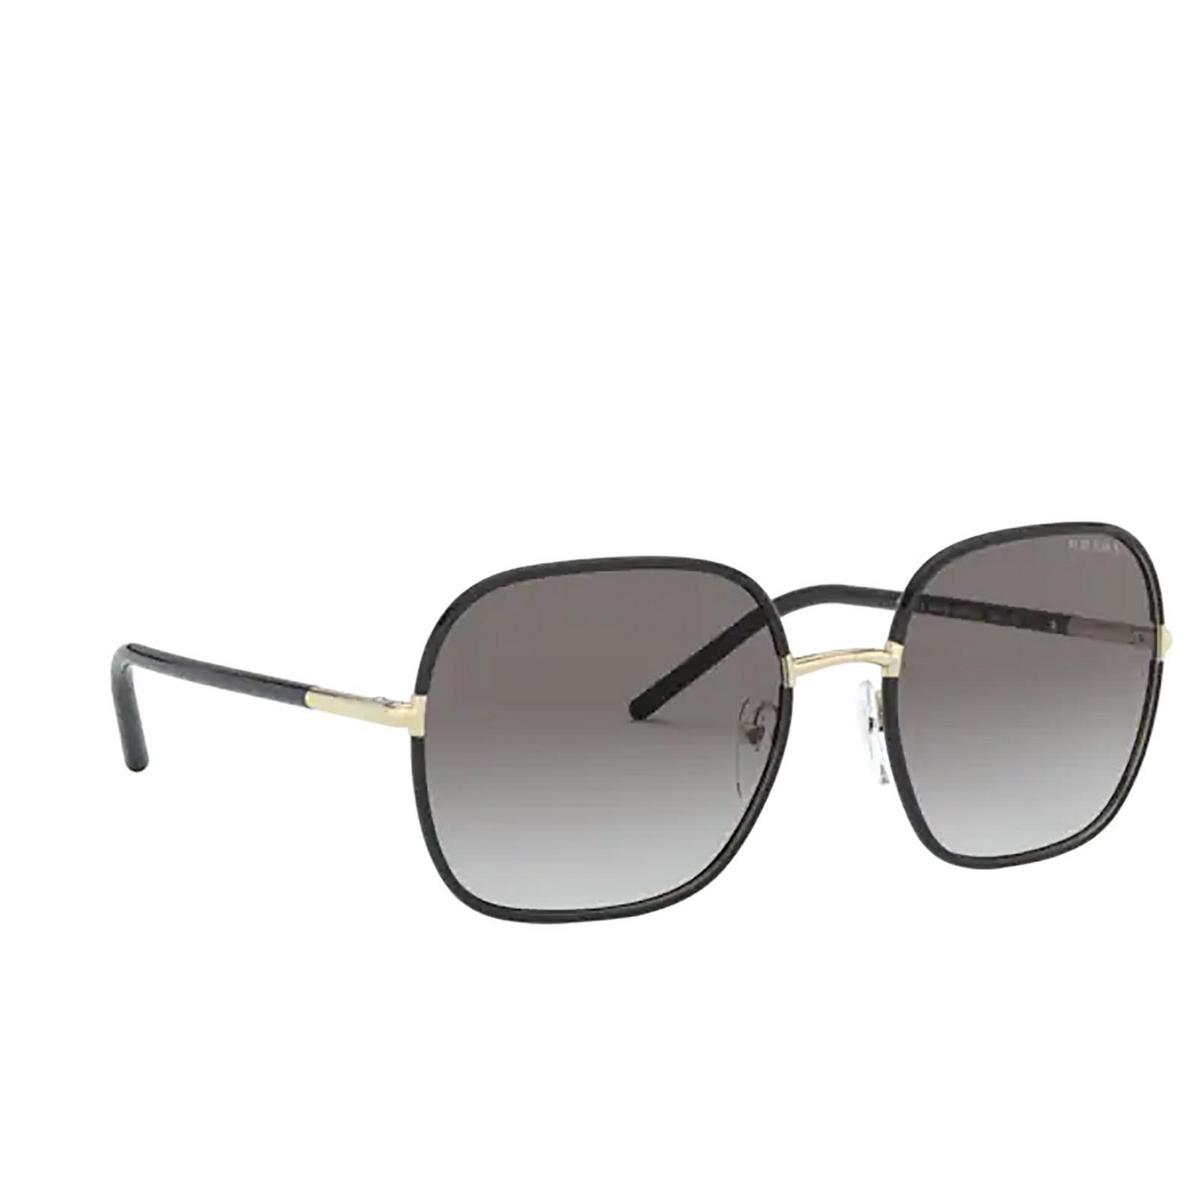 Prada® Square Sunglasses: PR 67XS color Pale Gold / Black AAV0A7.